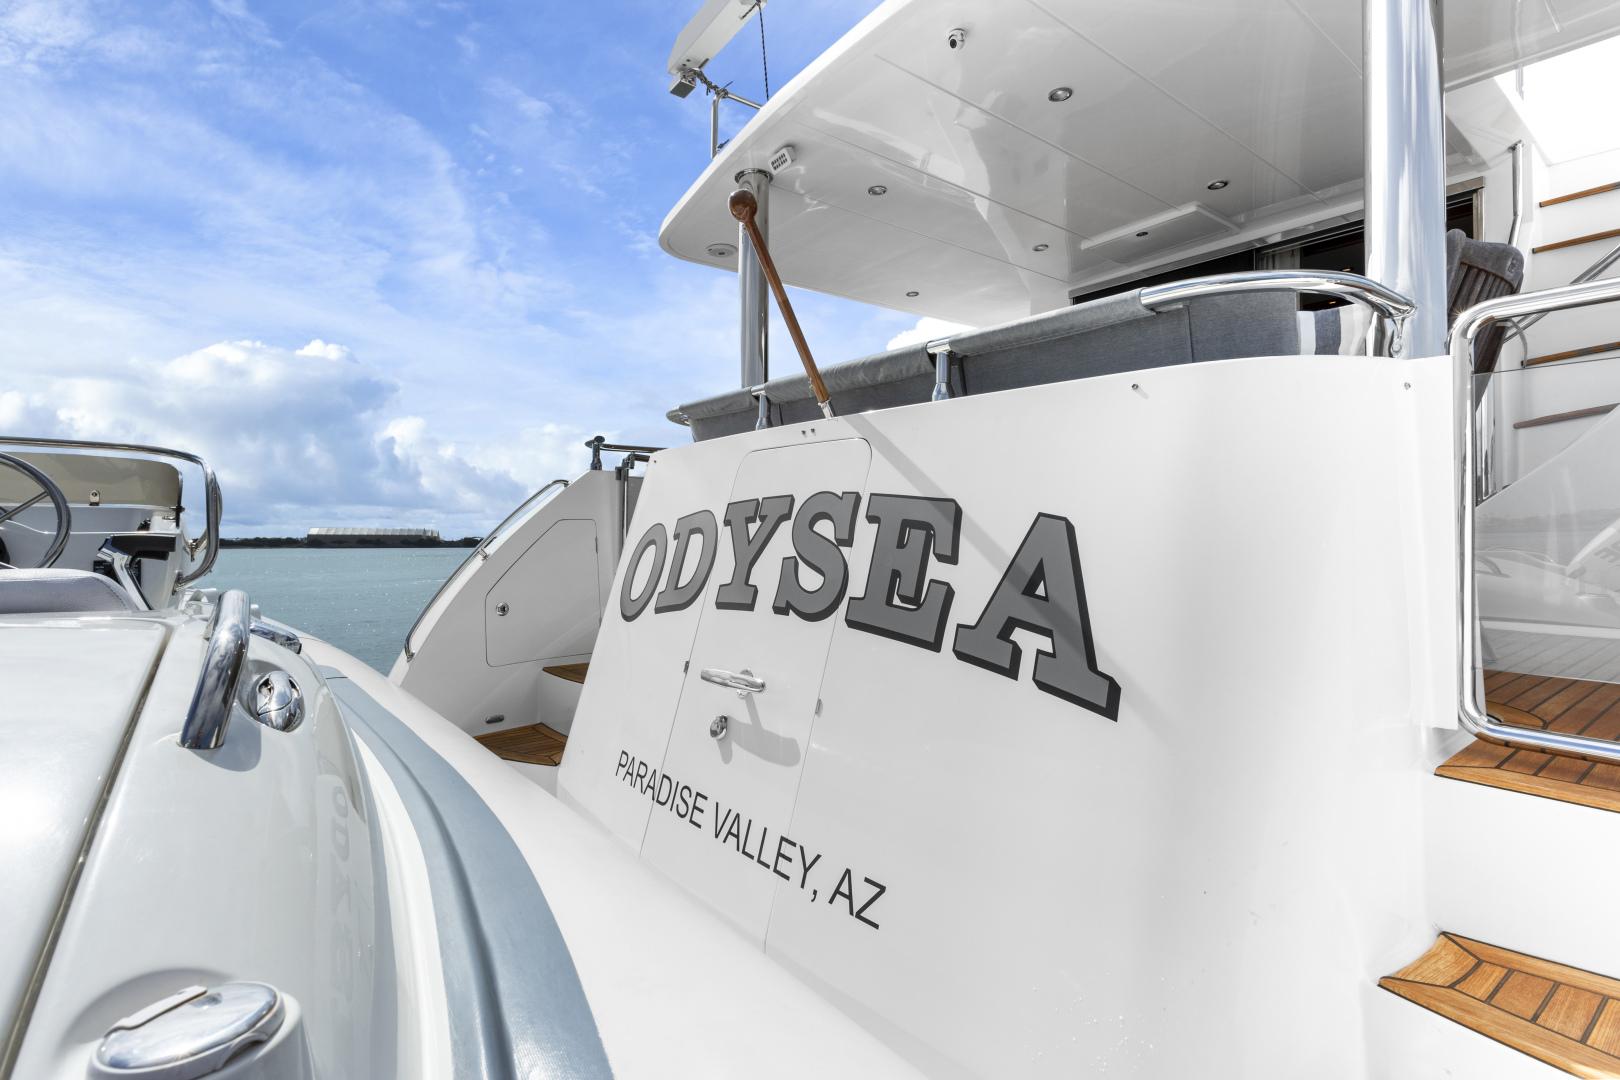 Hampton-76 Skylounge Motoryacht 2014-ODYSEA San Diego-California-United States-STERN-1165193 | Thumbnail